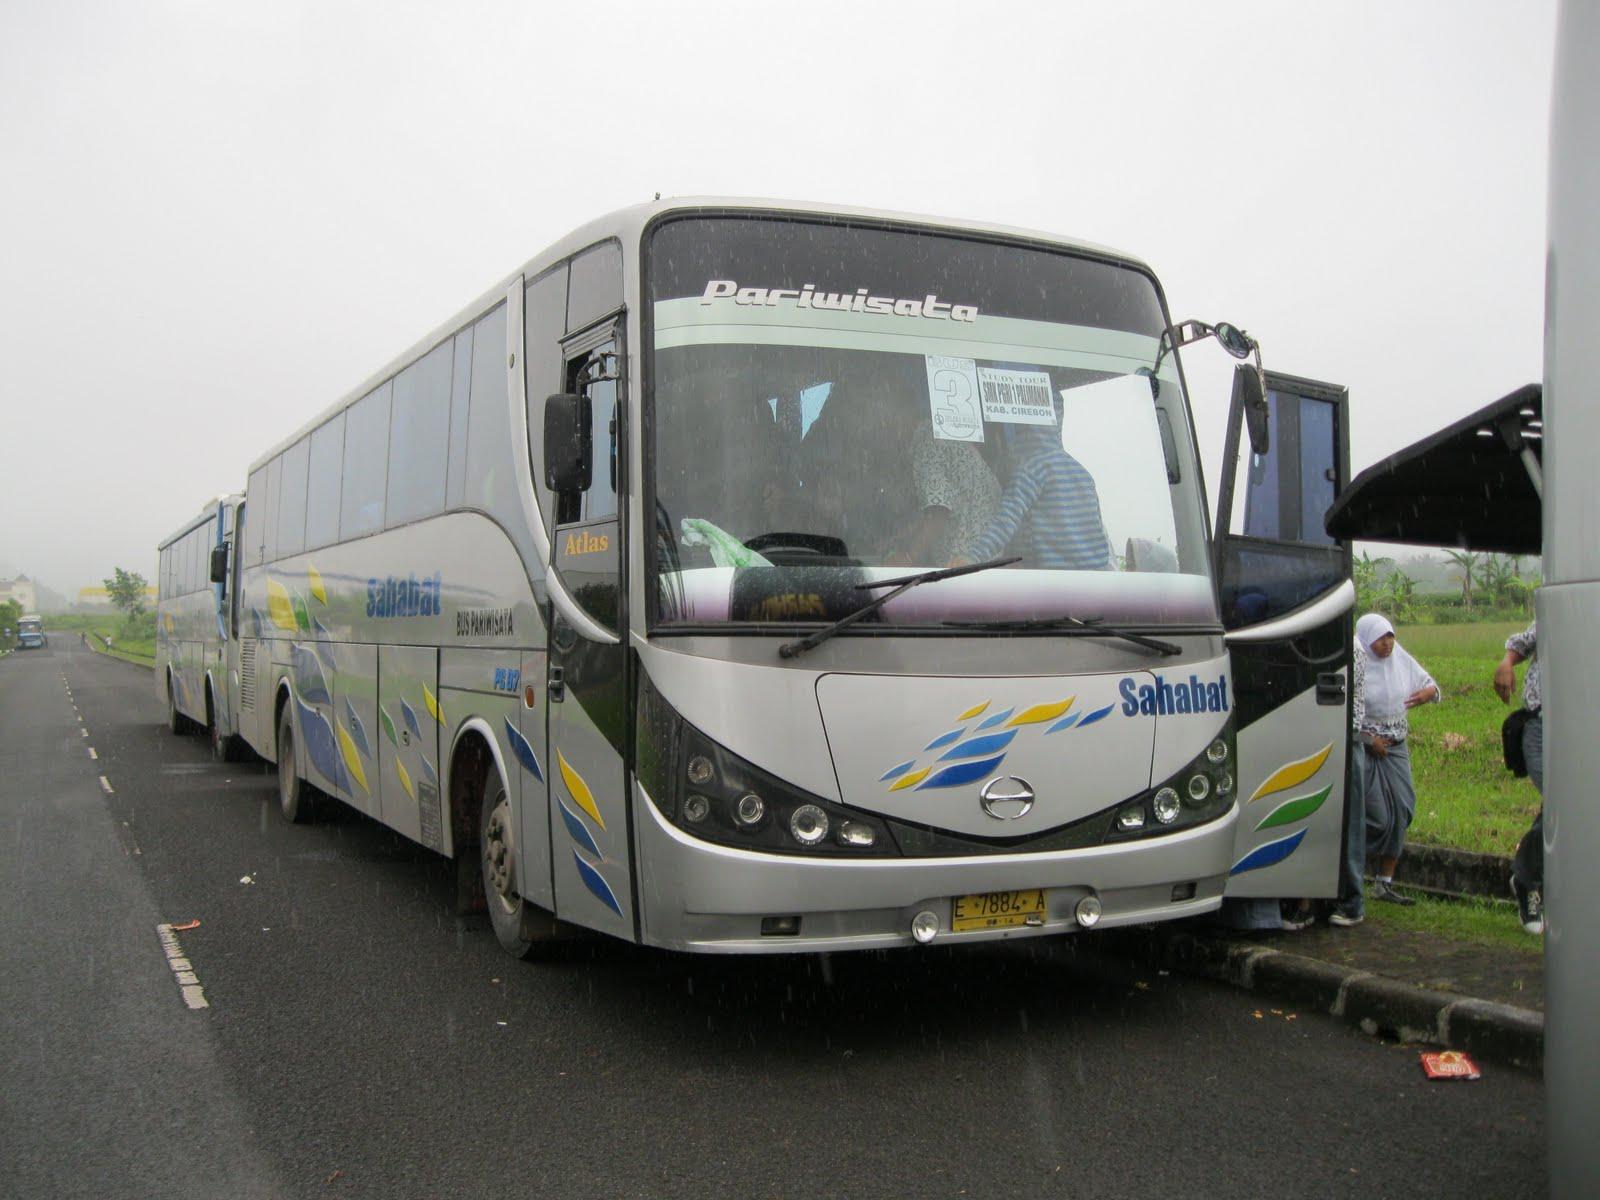 Bus pariwisata po sahabat pc 07